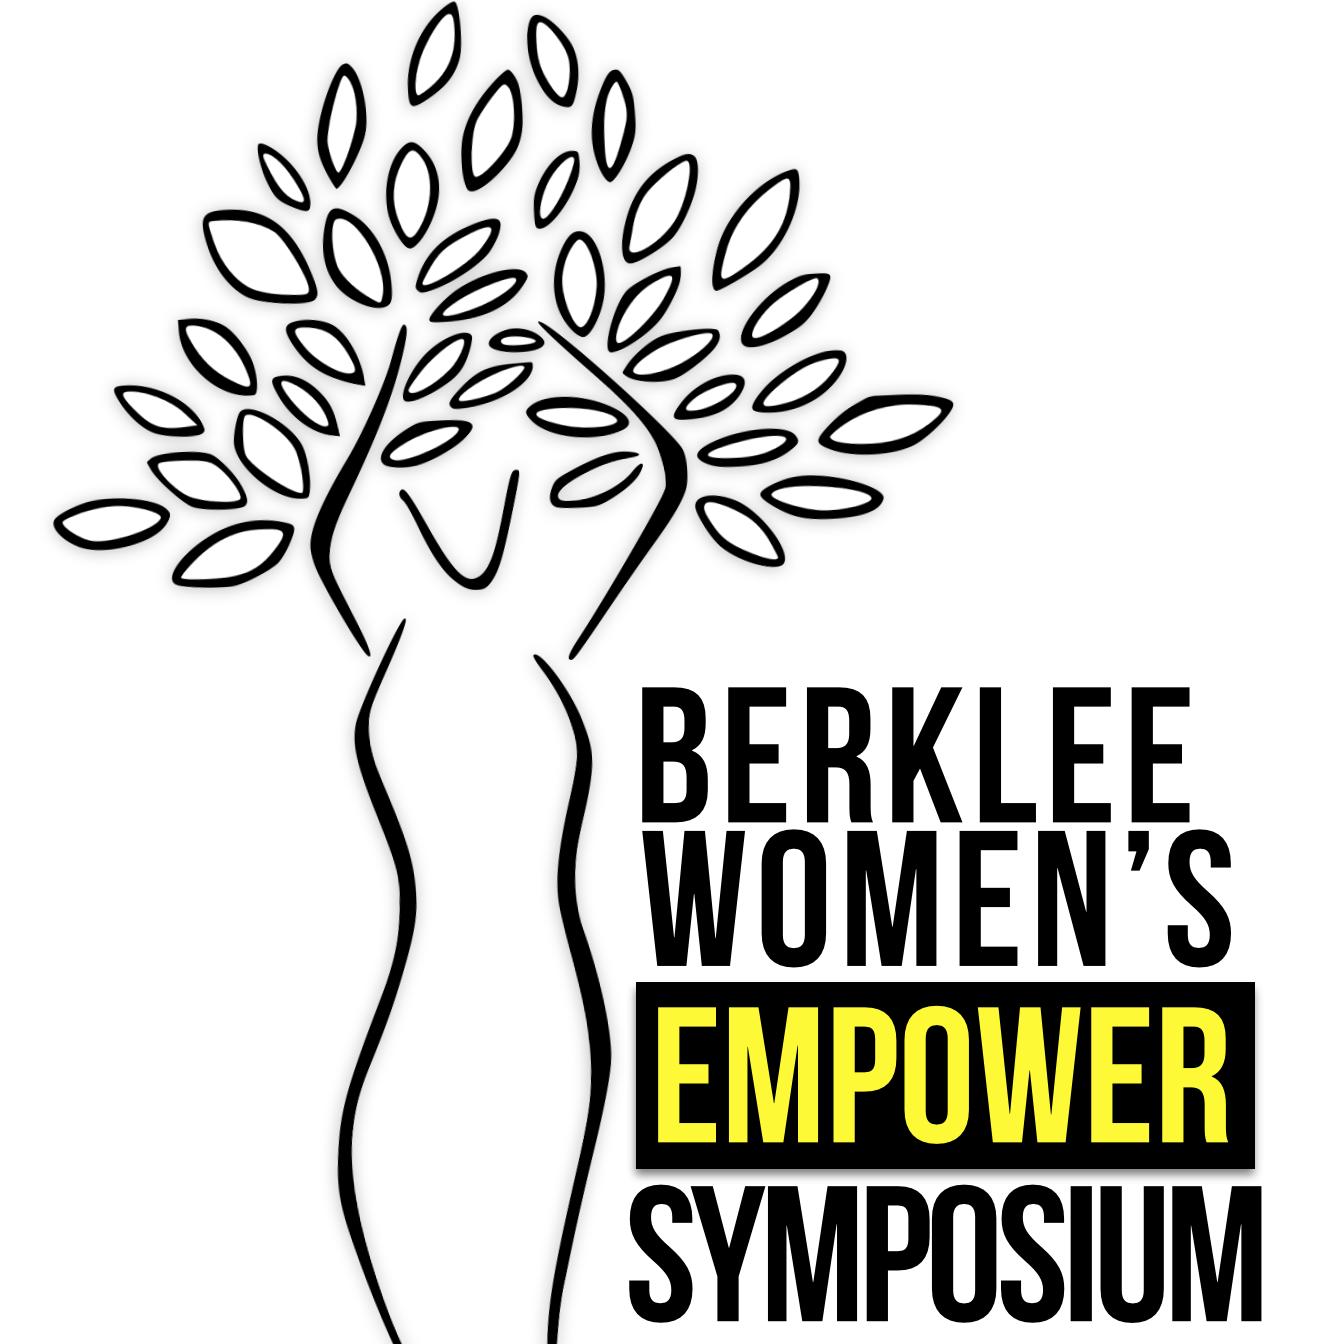 Berklee´s Women Empowerment Symposium